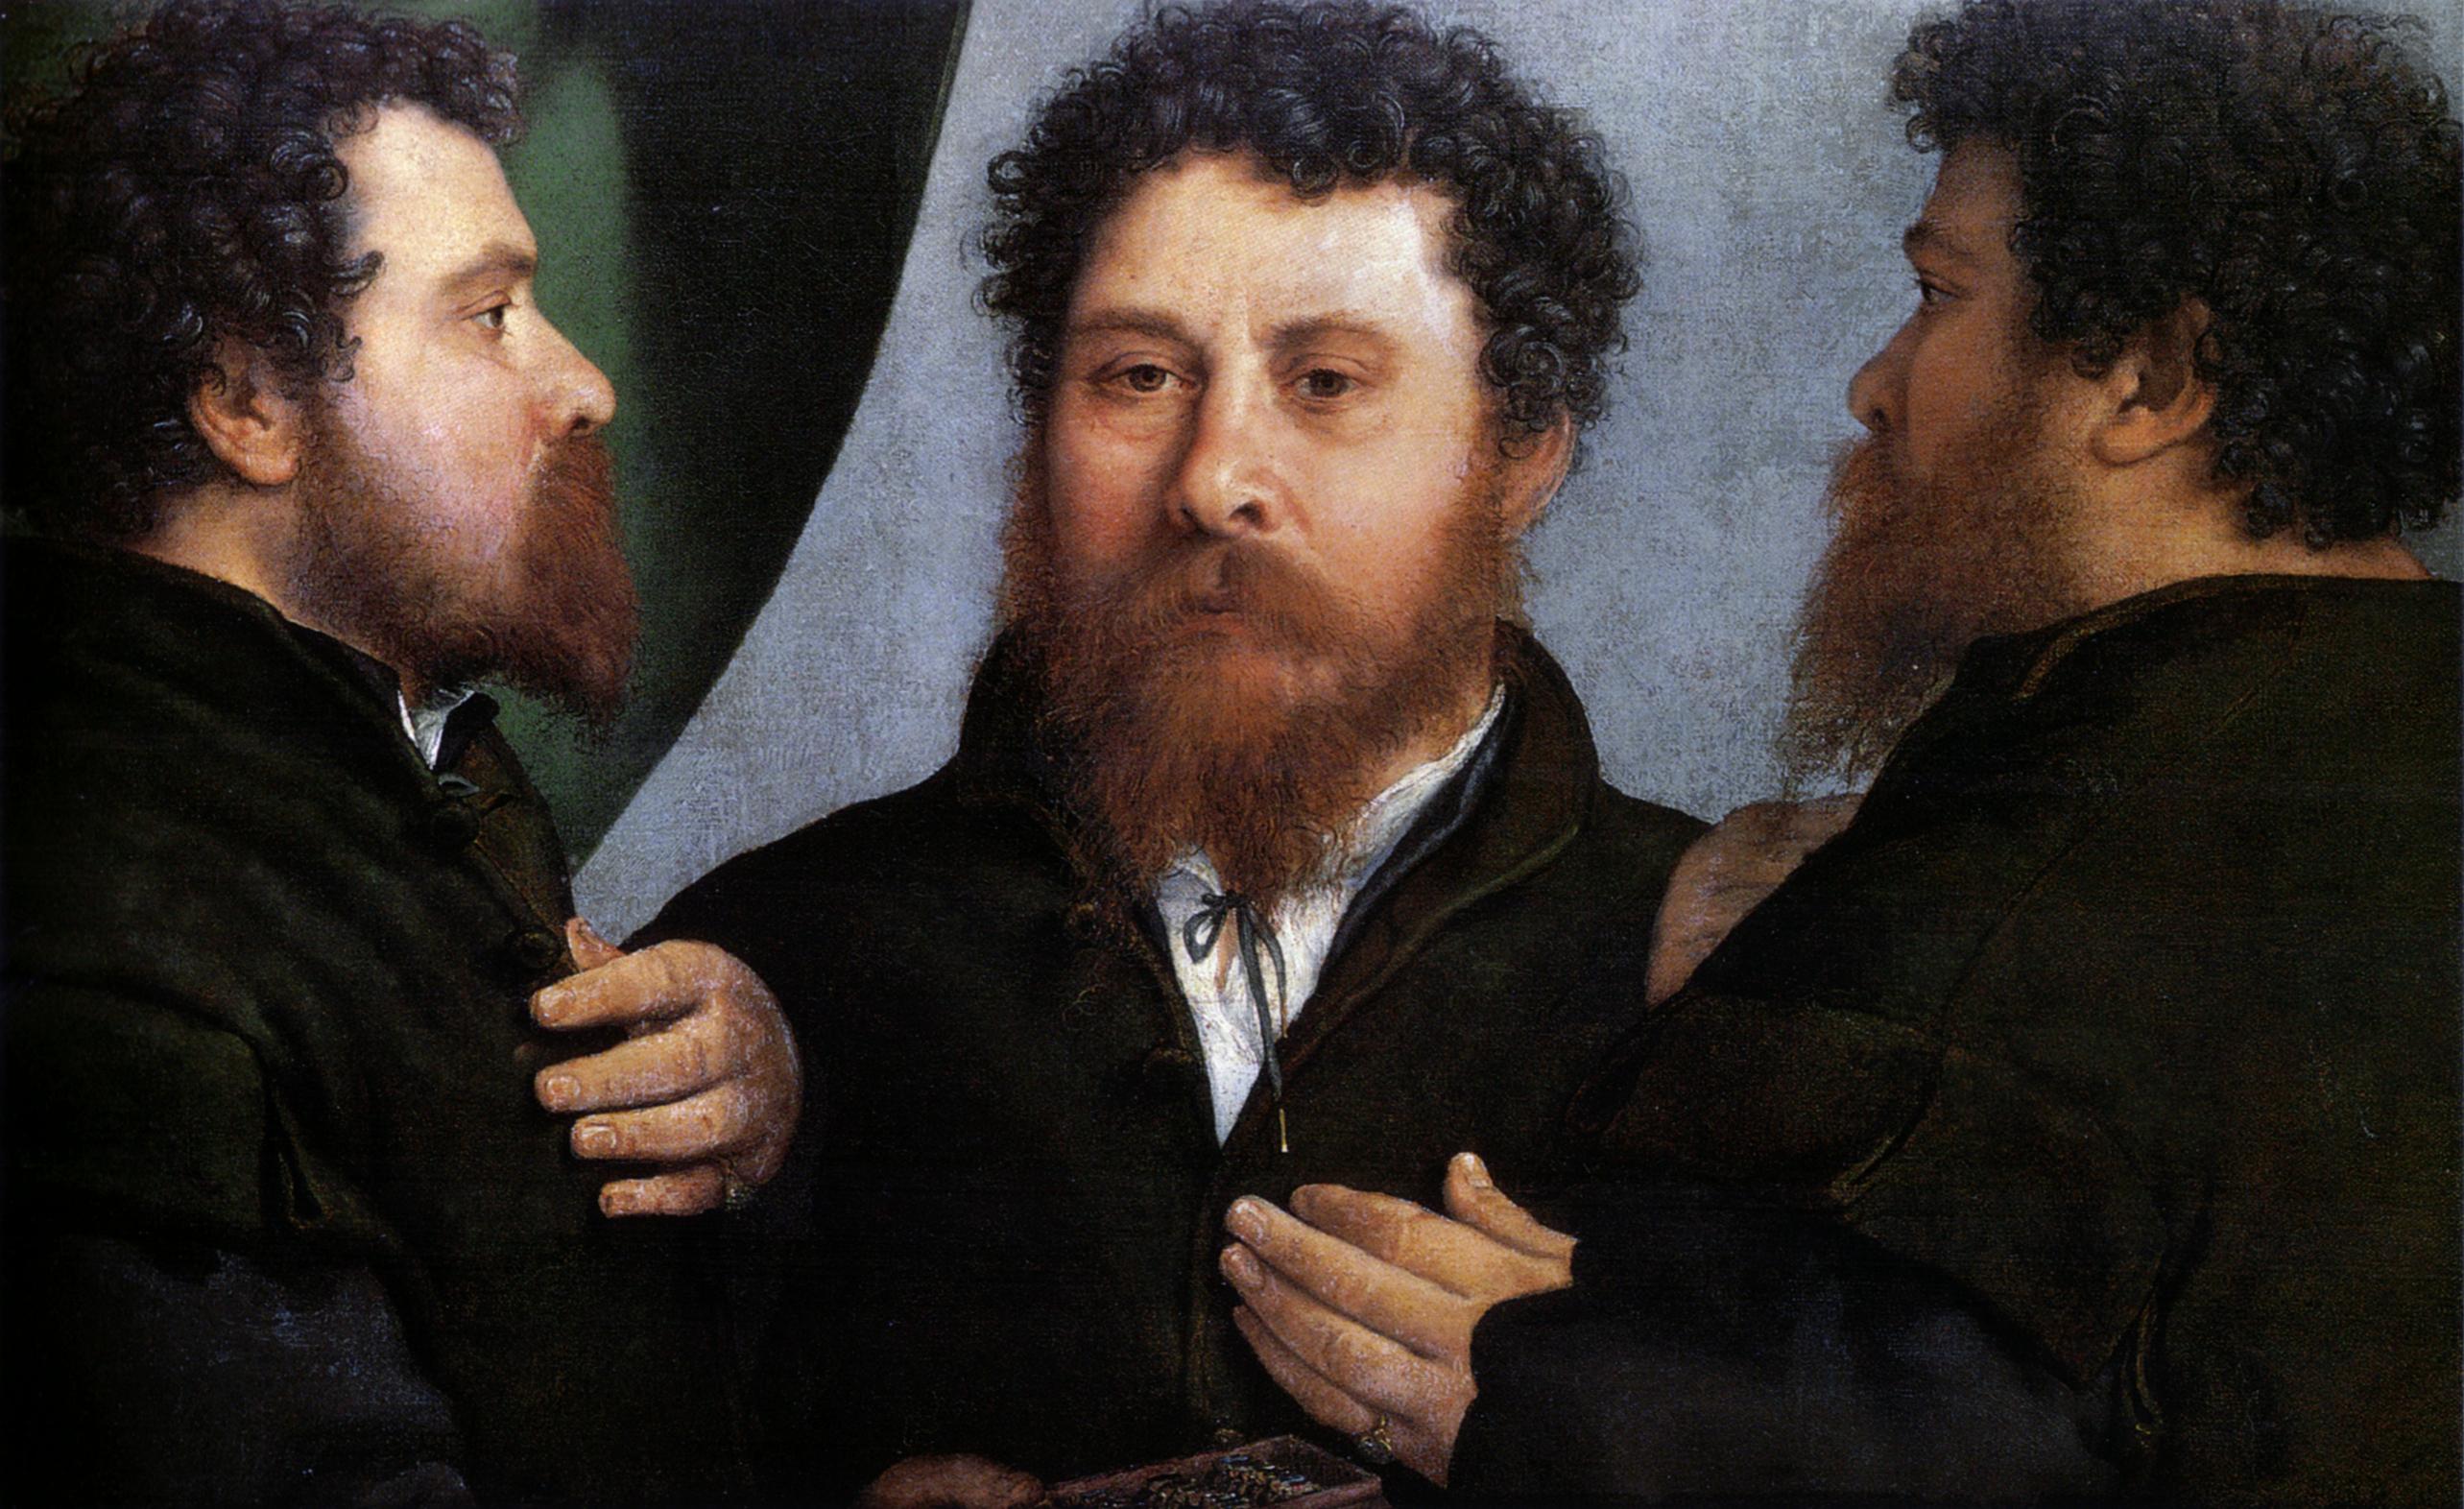 Lorenzo_Lotto_Triple portait d'un orfevre 1530  Kunsthistorisches Museum  Vienne